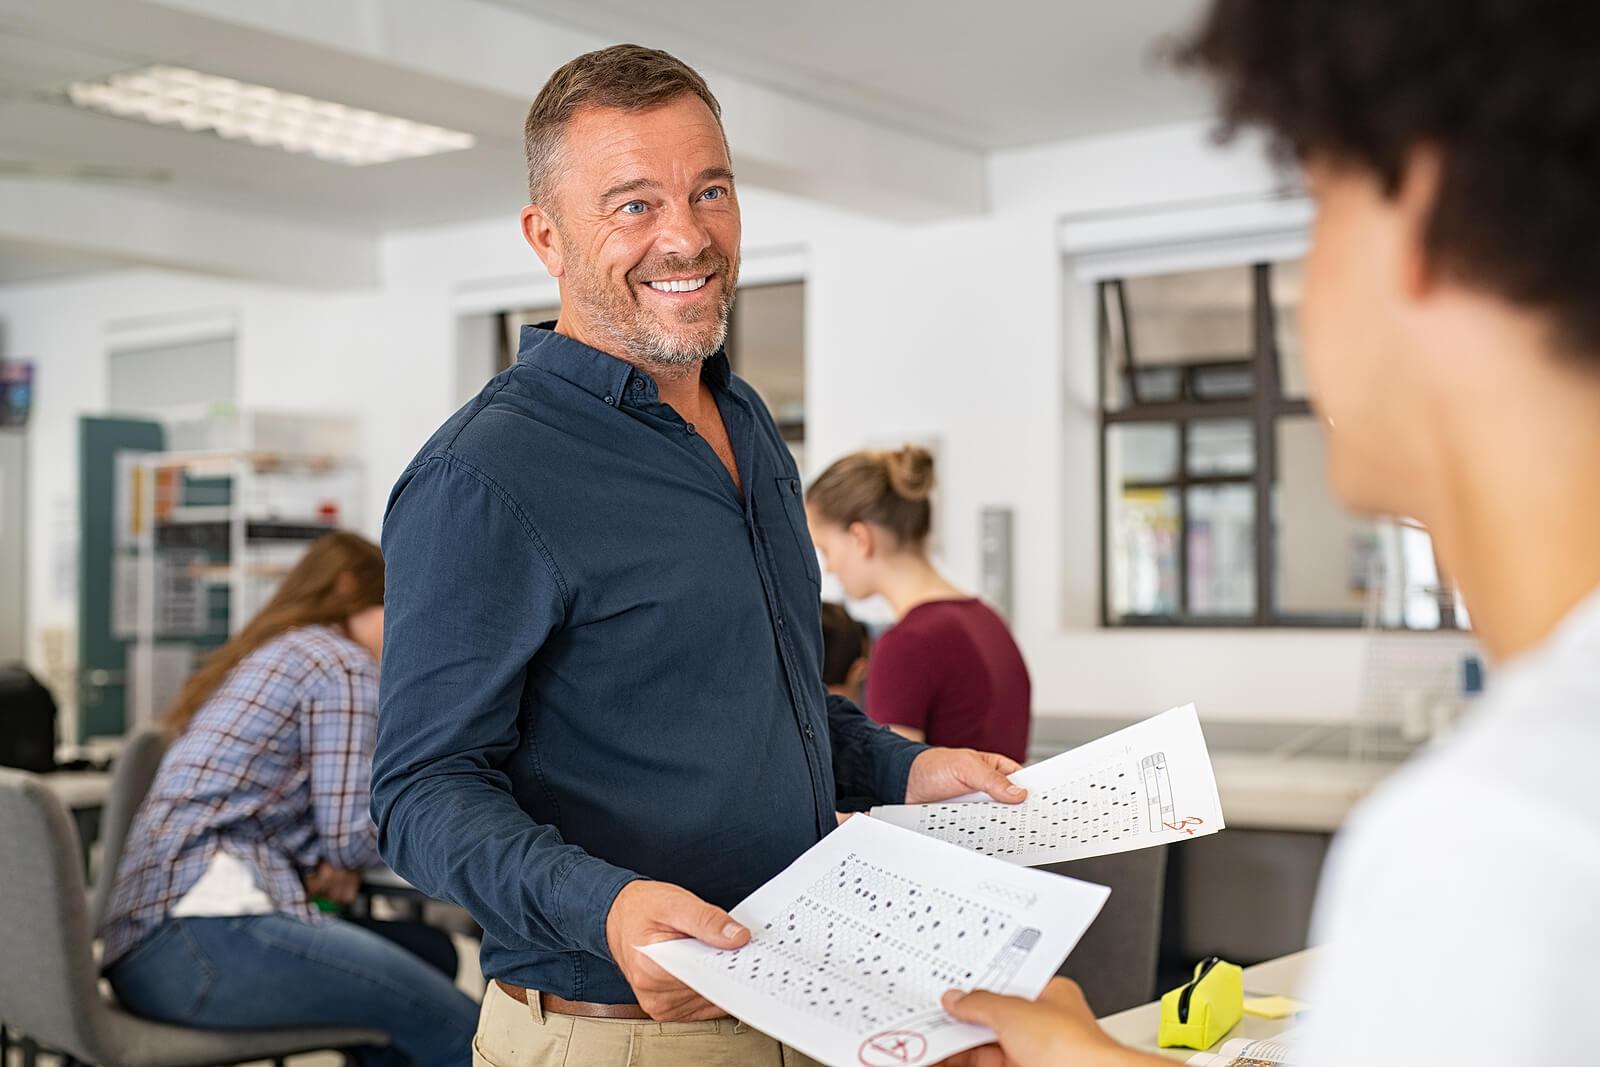 Profesor entregando un examen tipo test corregido a un alumno.